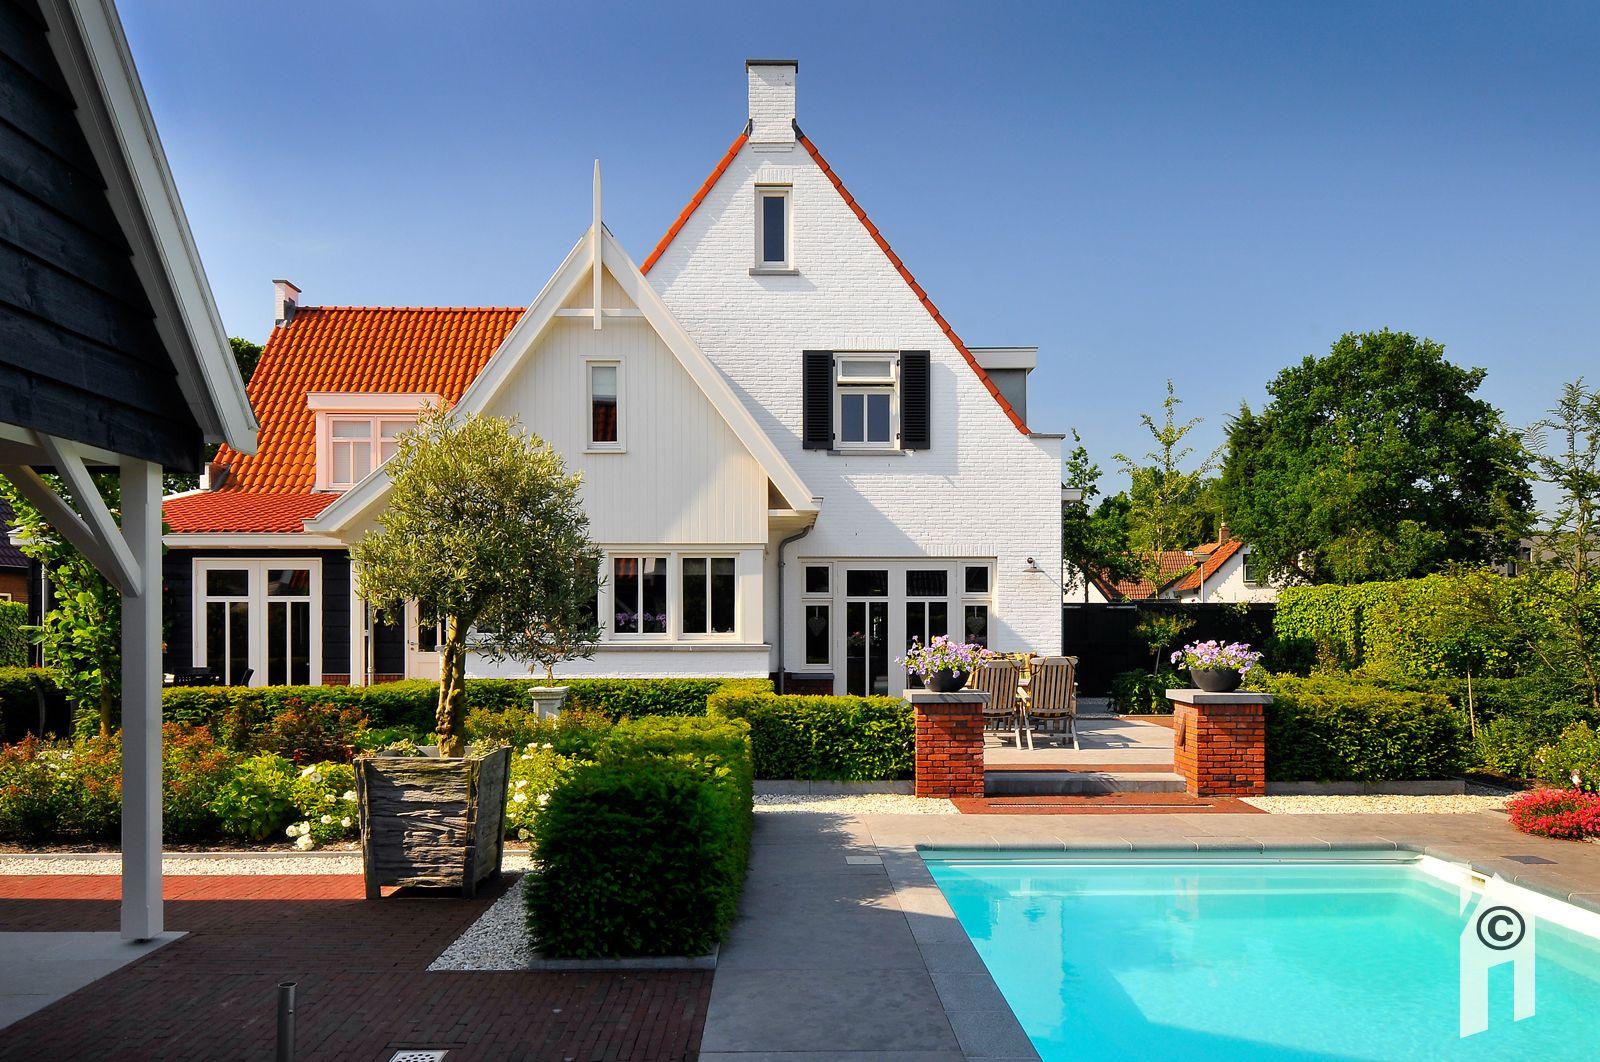 Z wonen goede architect of aannemer for Aannemer huis bouwen